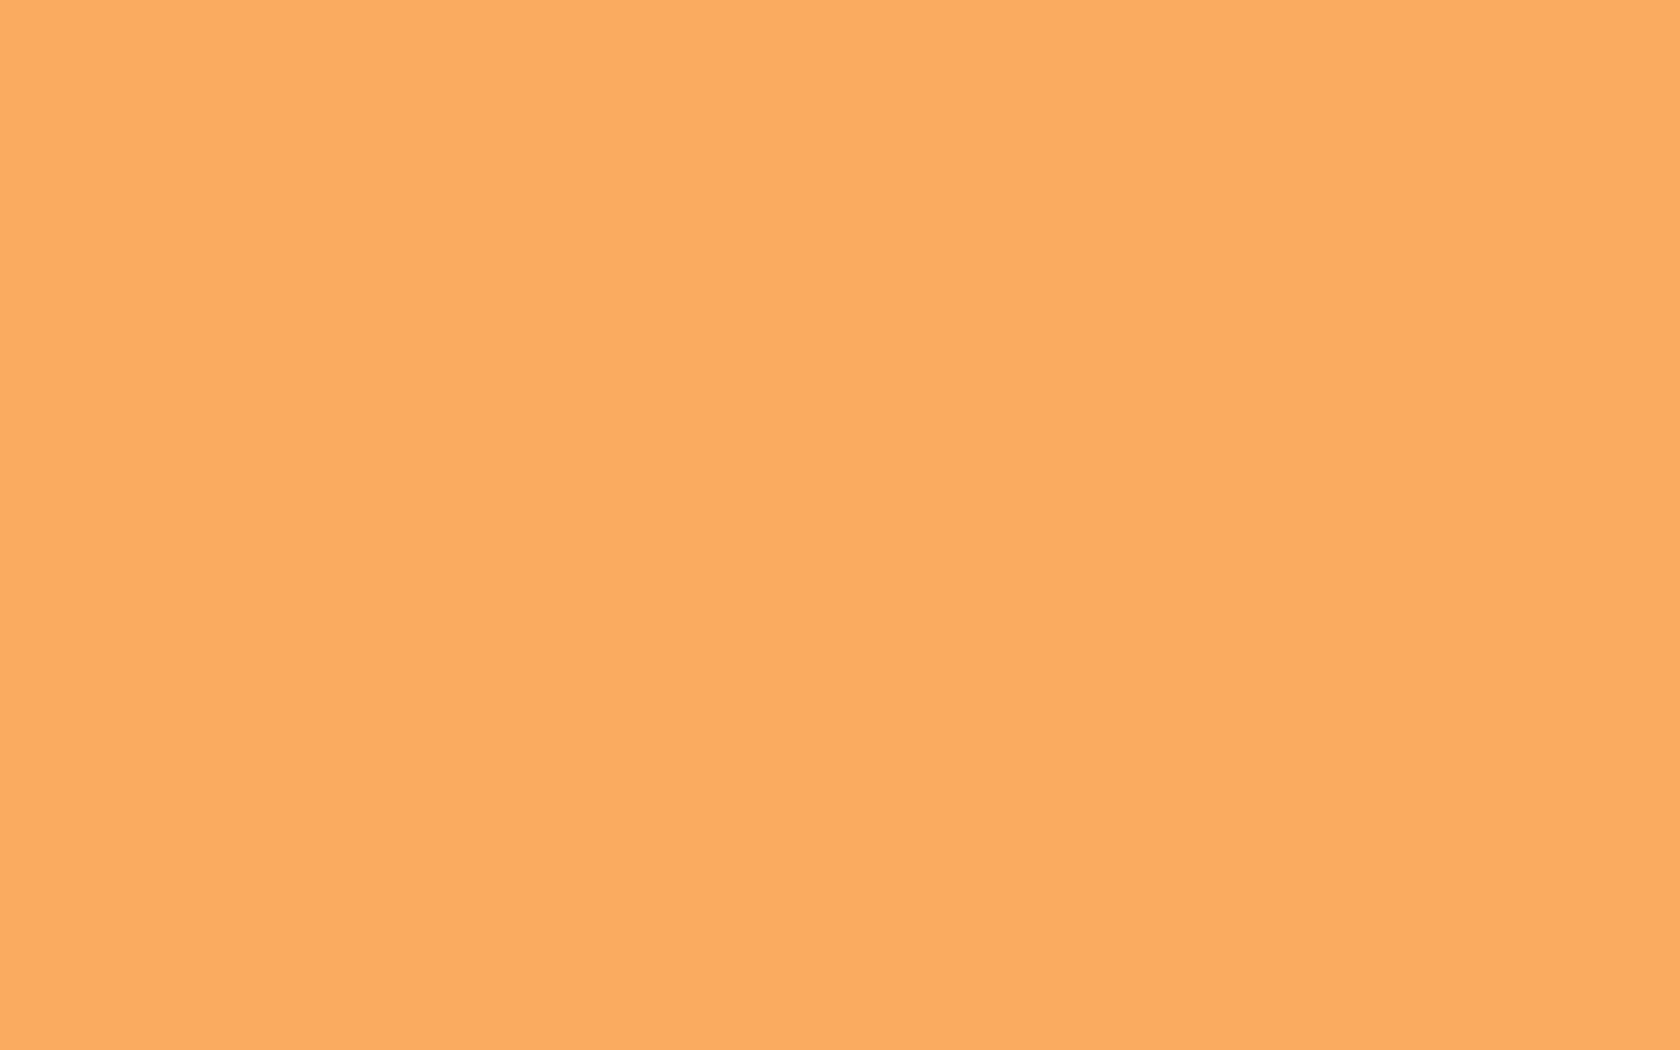 1680x1050 Rajah Solid Color Background